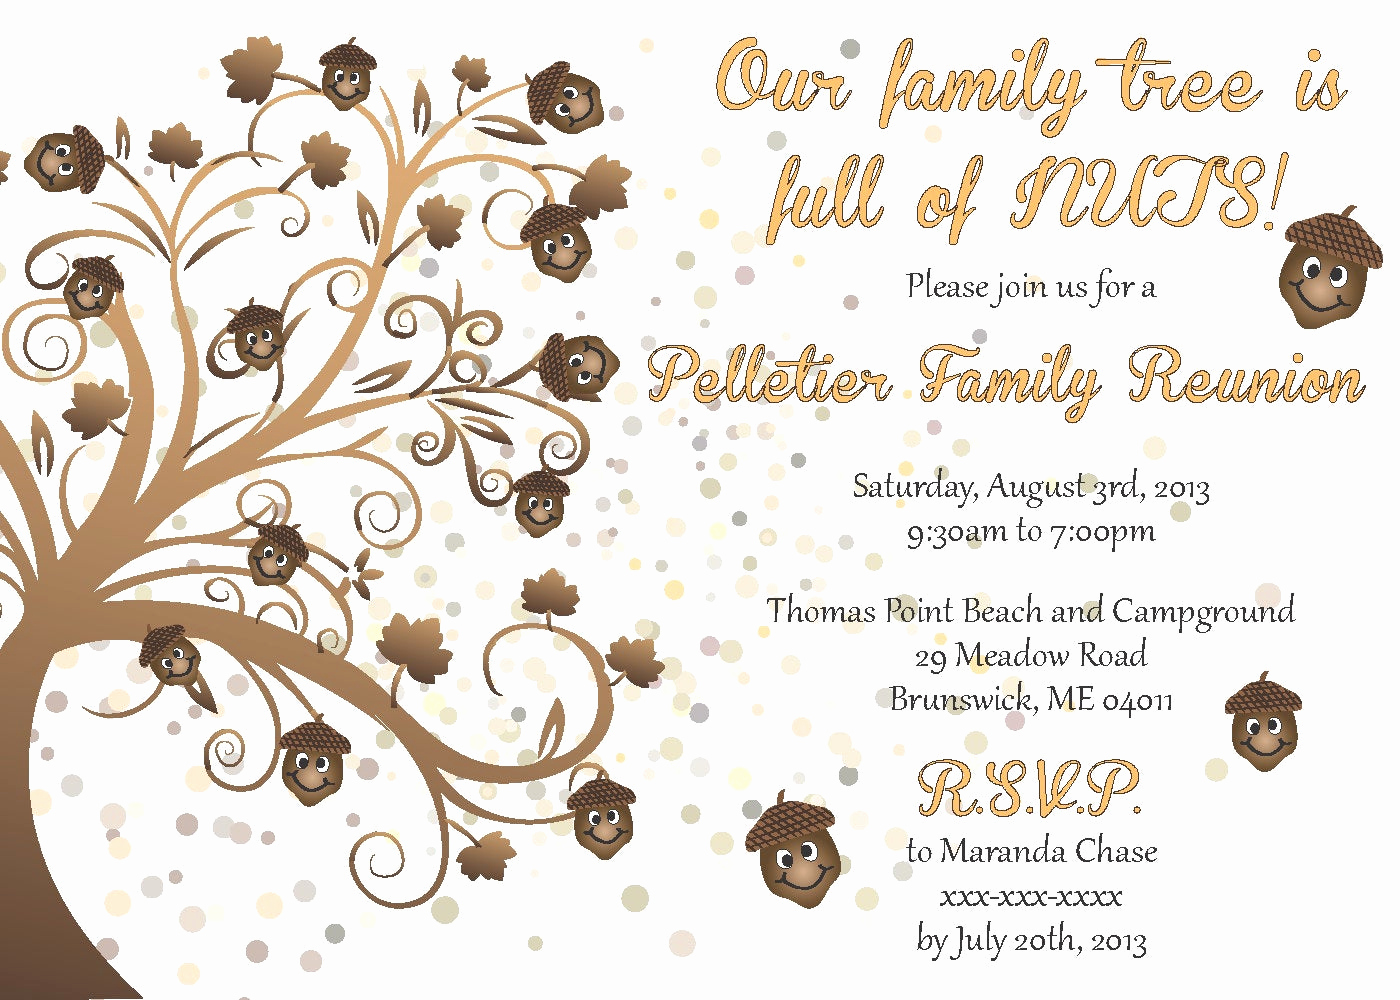 Family Reunion Invitation Ideas Beautiful Family Reunion Invitation by Littlebopress On Etsy